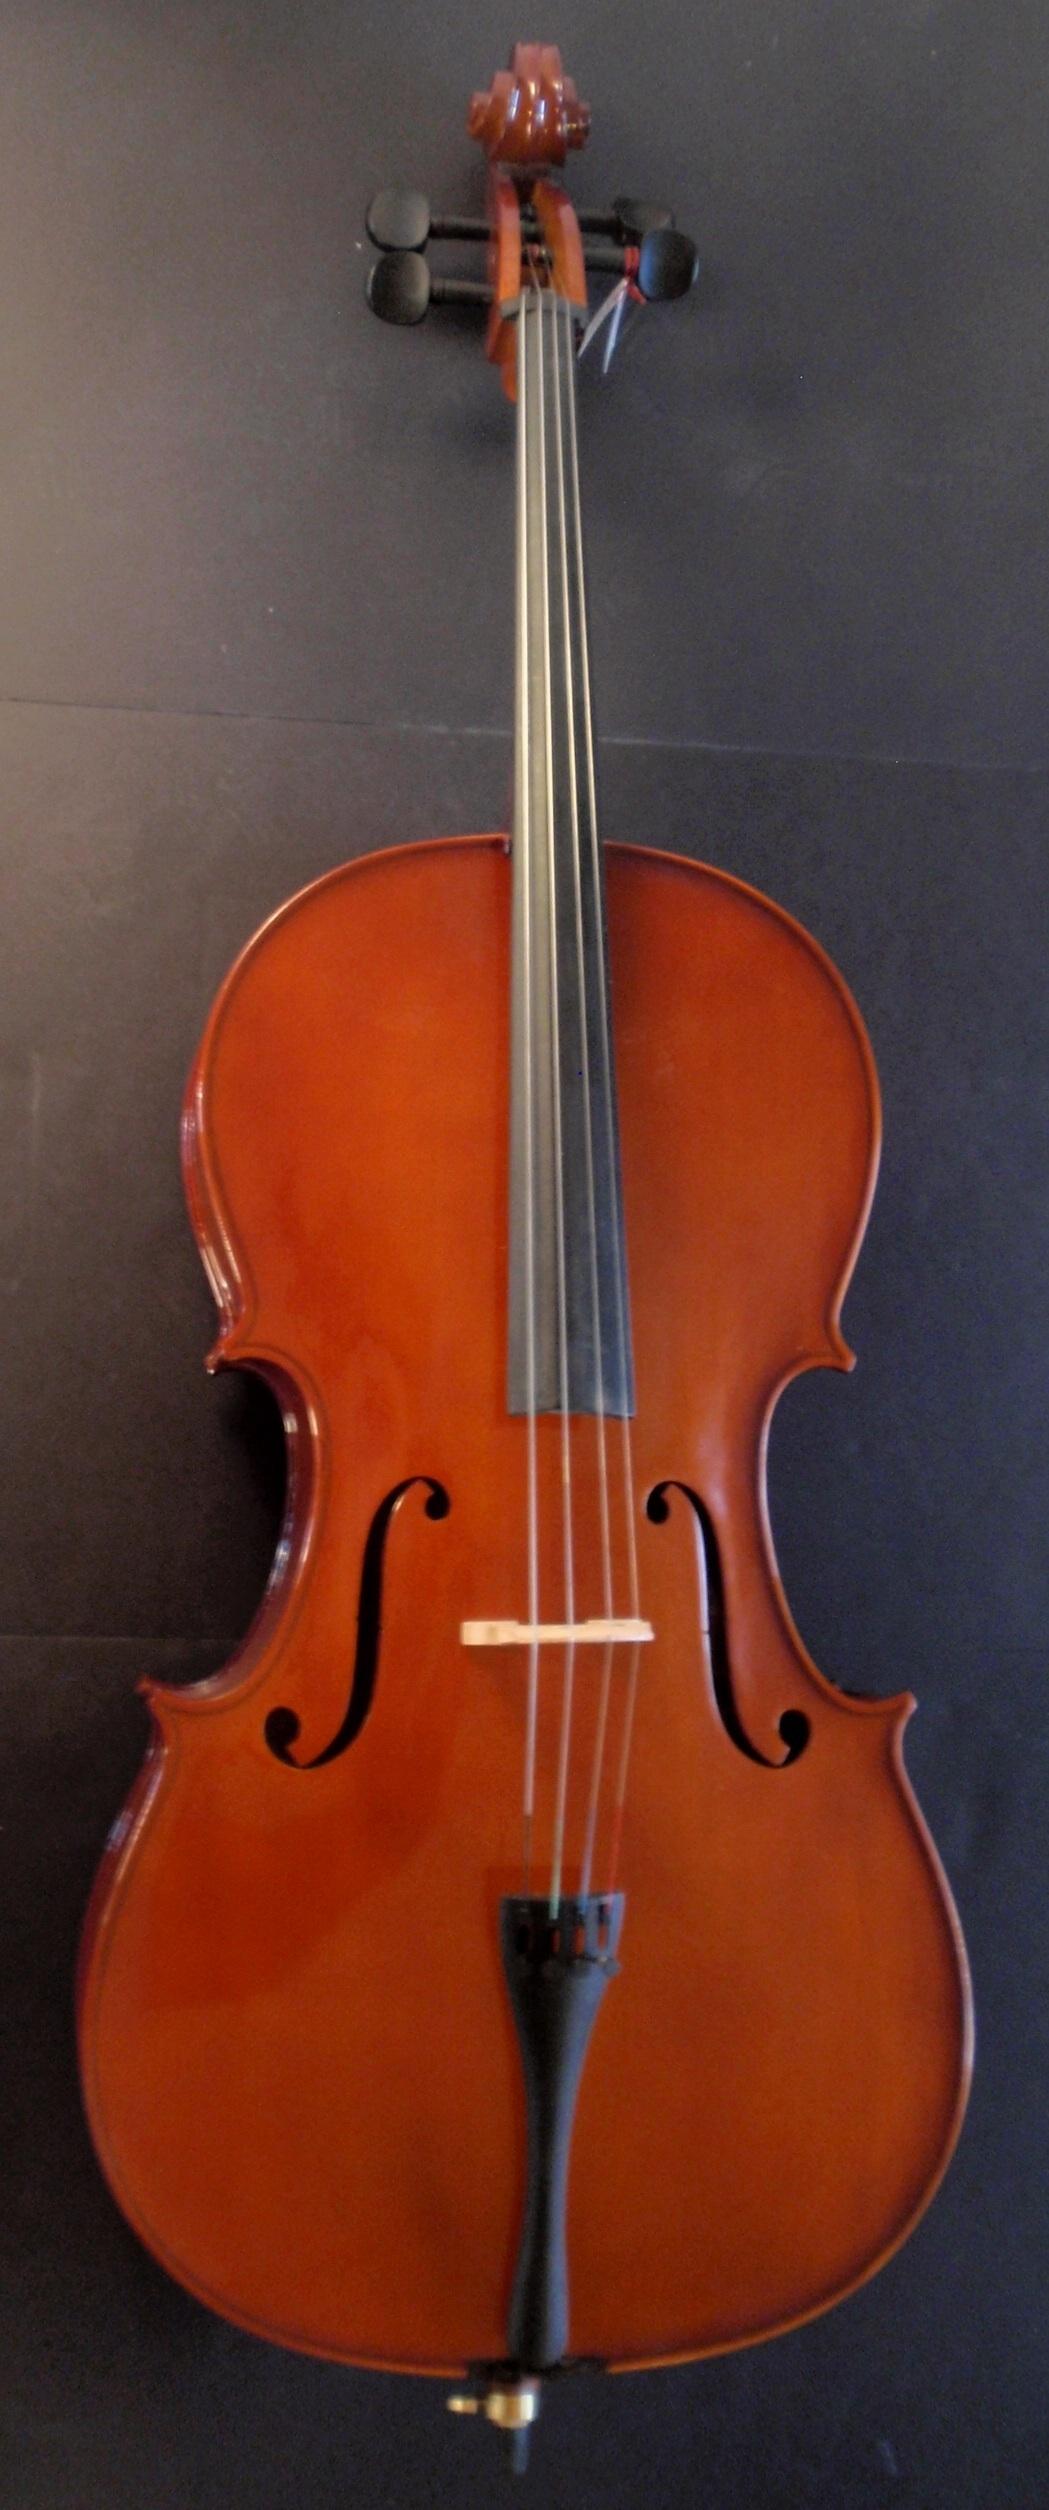 Allegro Cello Frontview